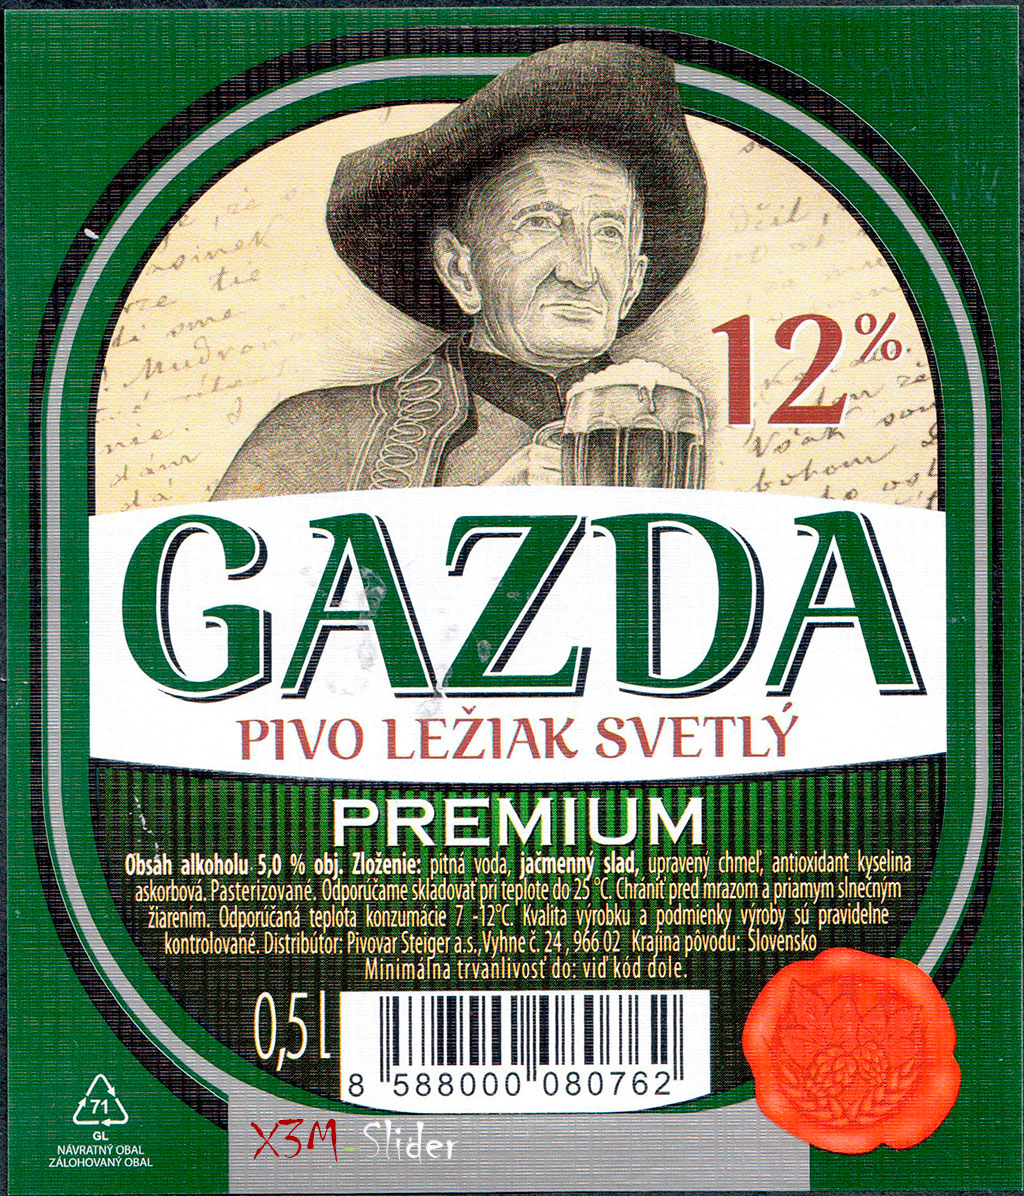 Steiger - Gazda Premium Pivo Leziak Svetly